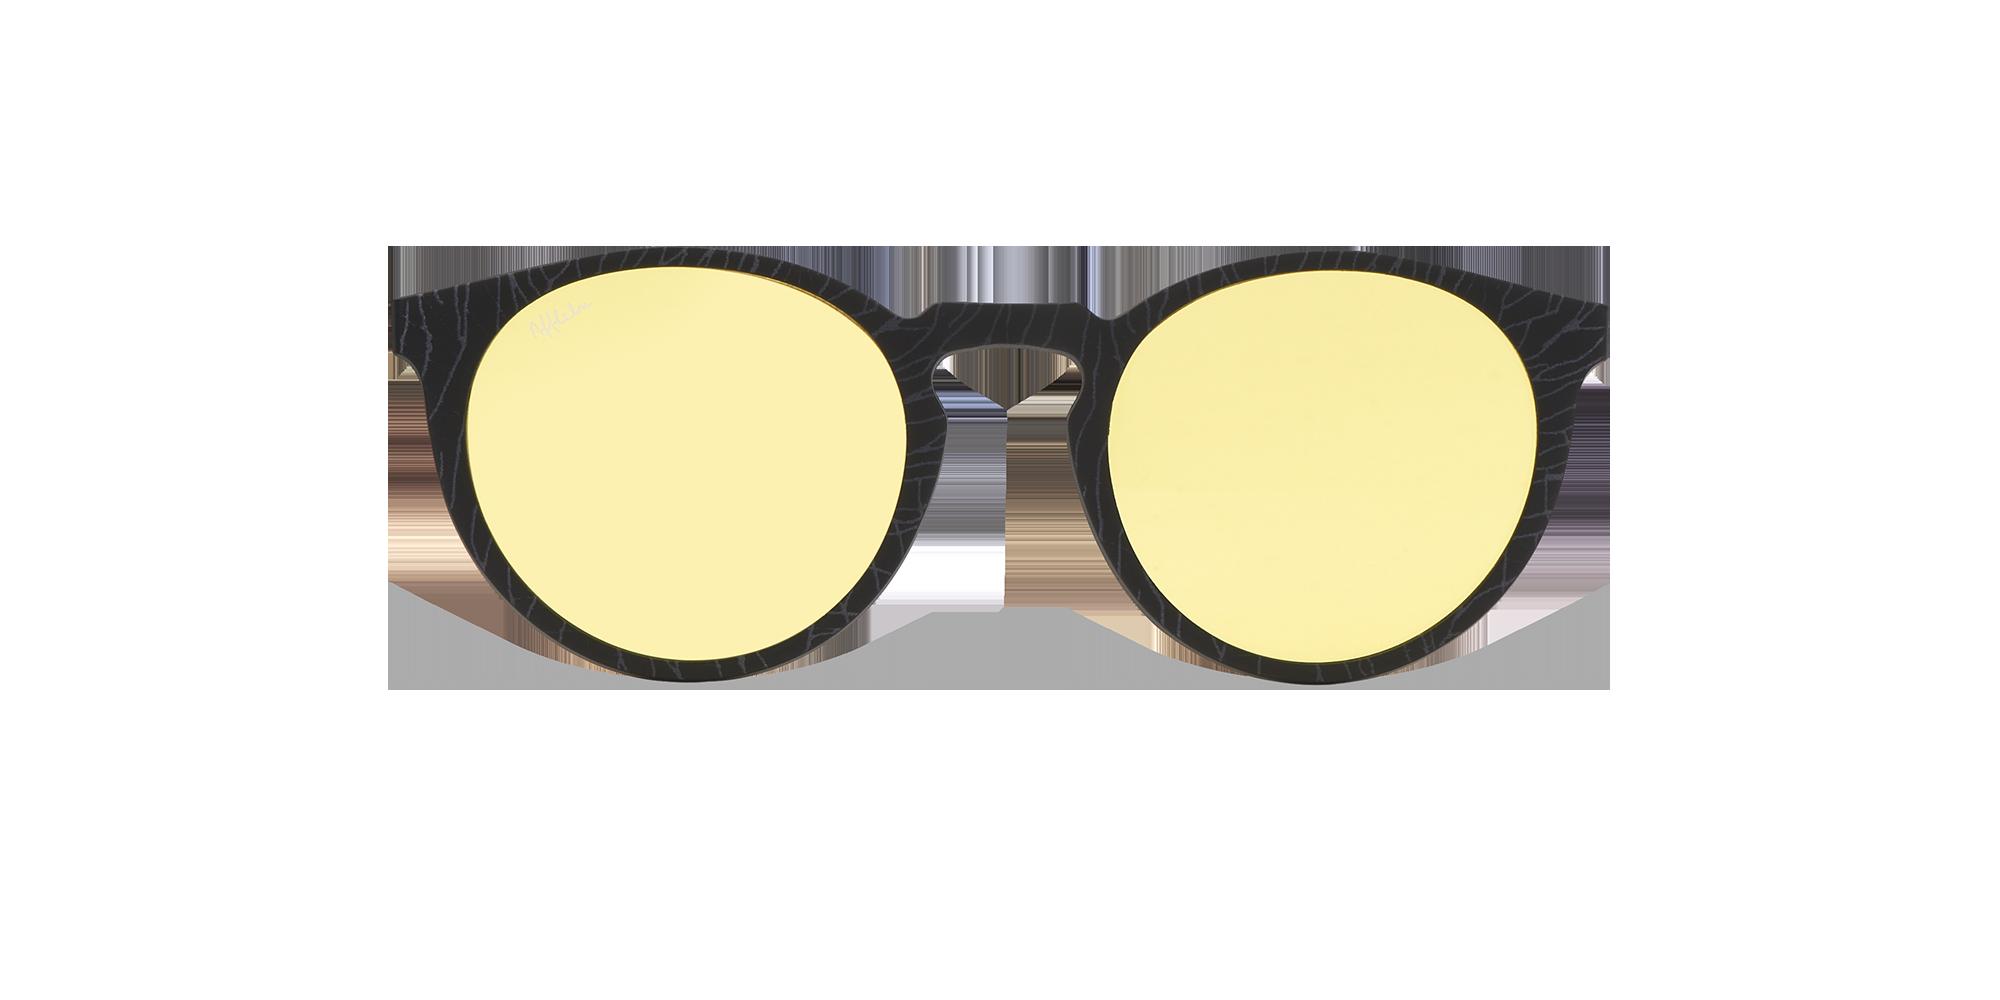 afflelou/france/products/smart_clip/clips_glasses/TMK35YEBK014820.png